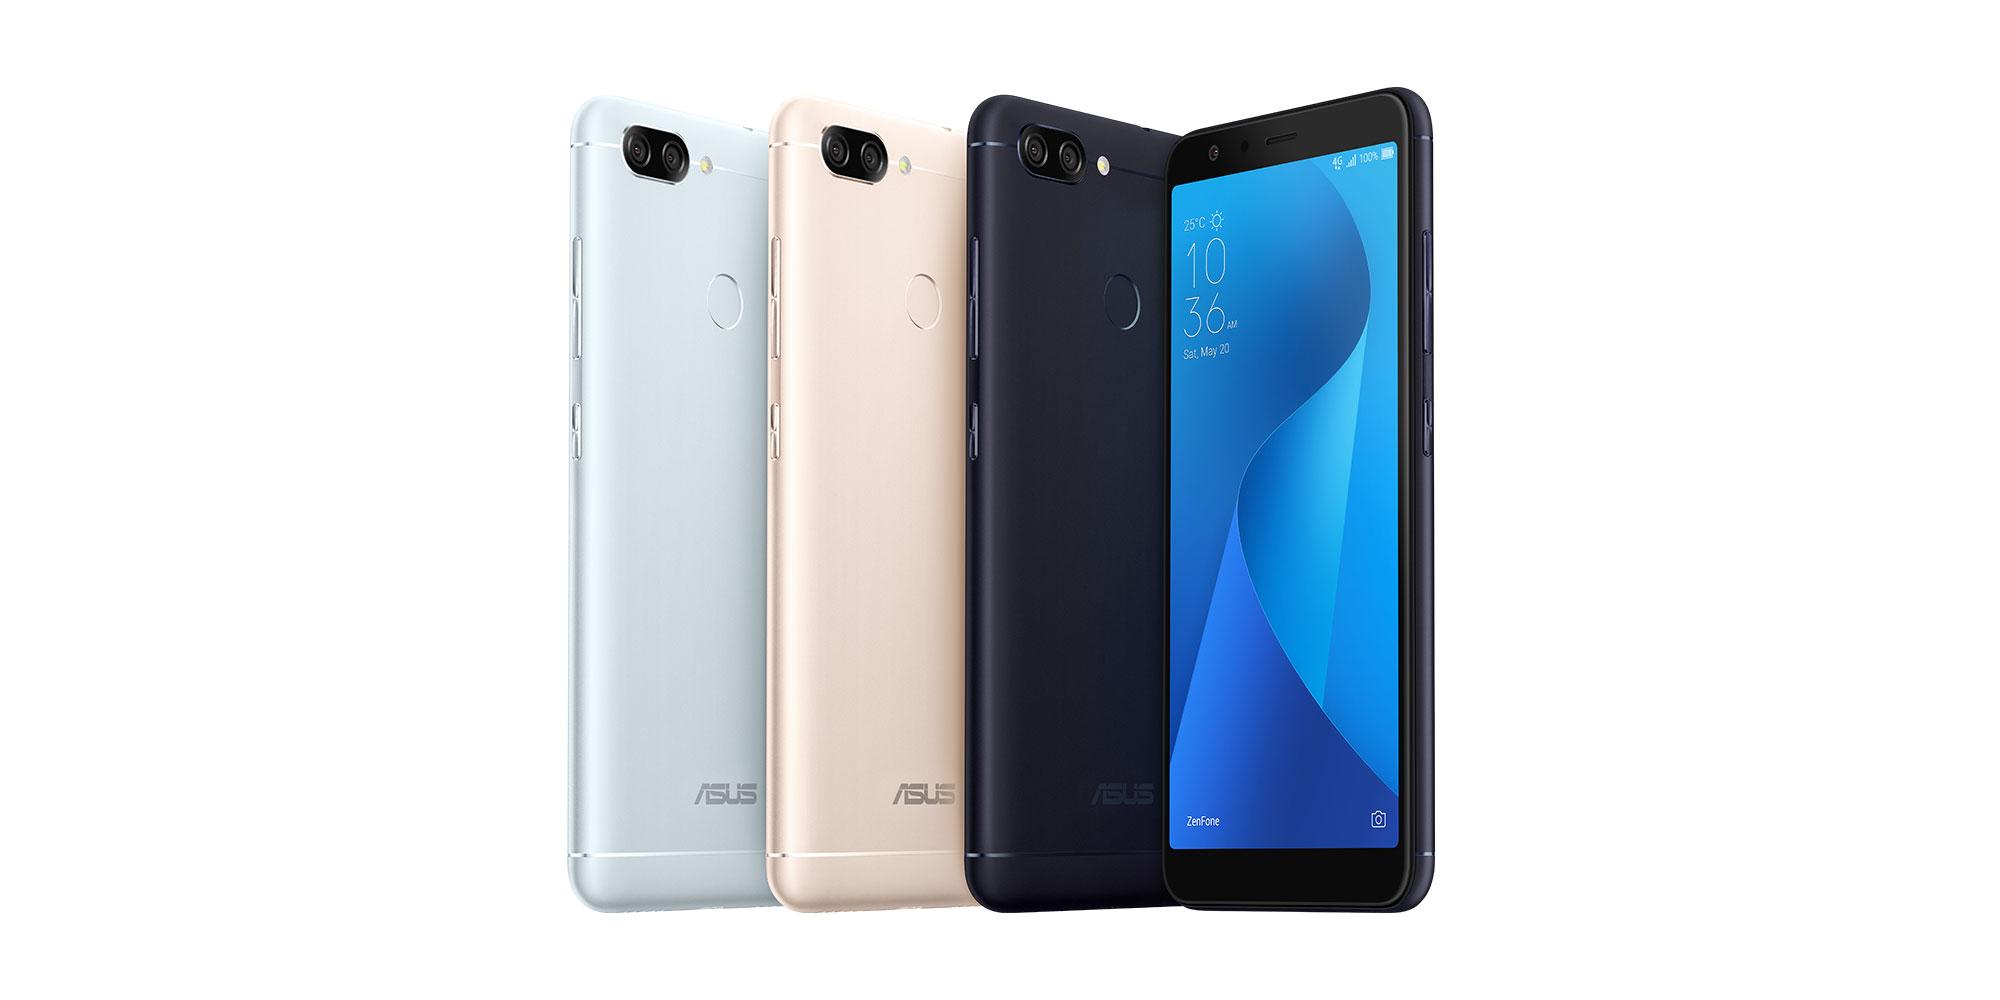 Asus Zenfone Max Plus M1 57 Inch 2160 X 1080 Display Dual Rear